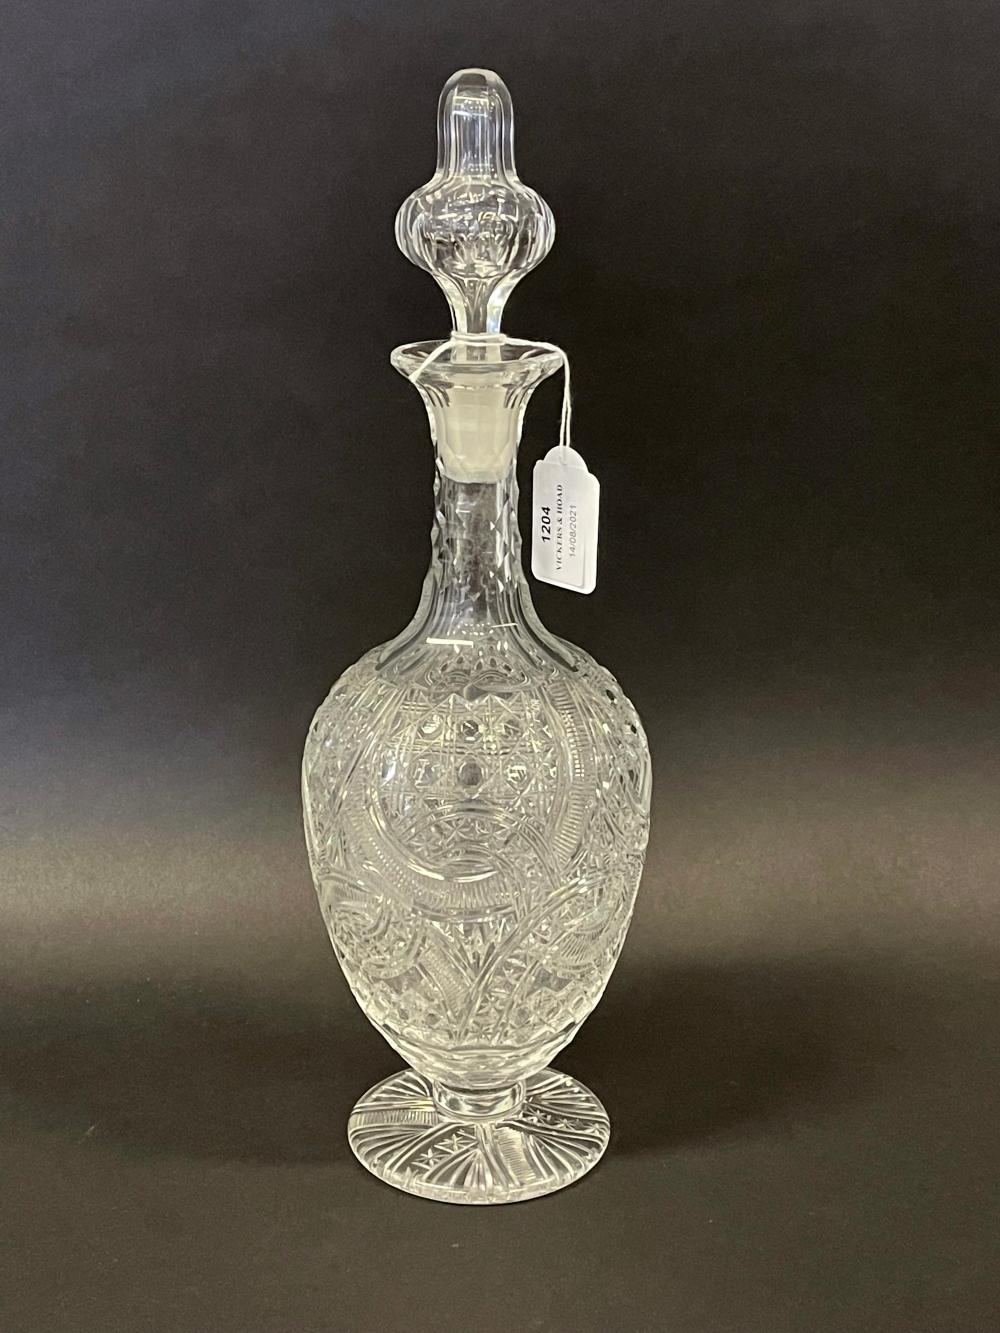 Fine heavy cut crystal decanter, approx 36 cm high